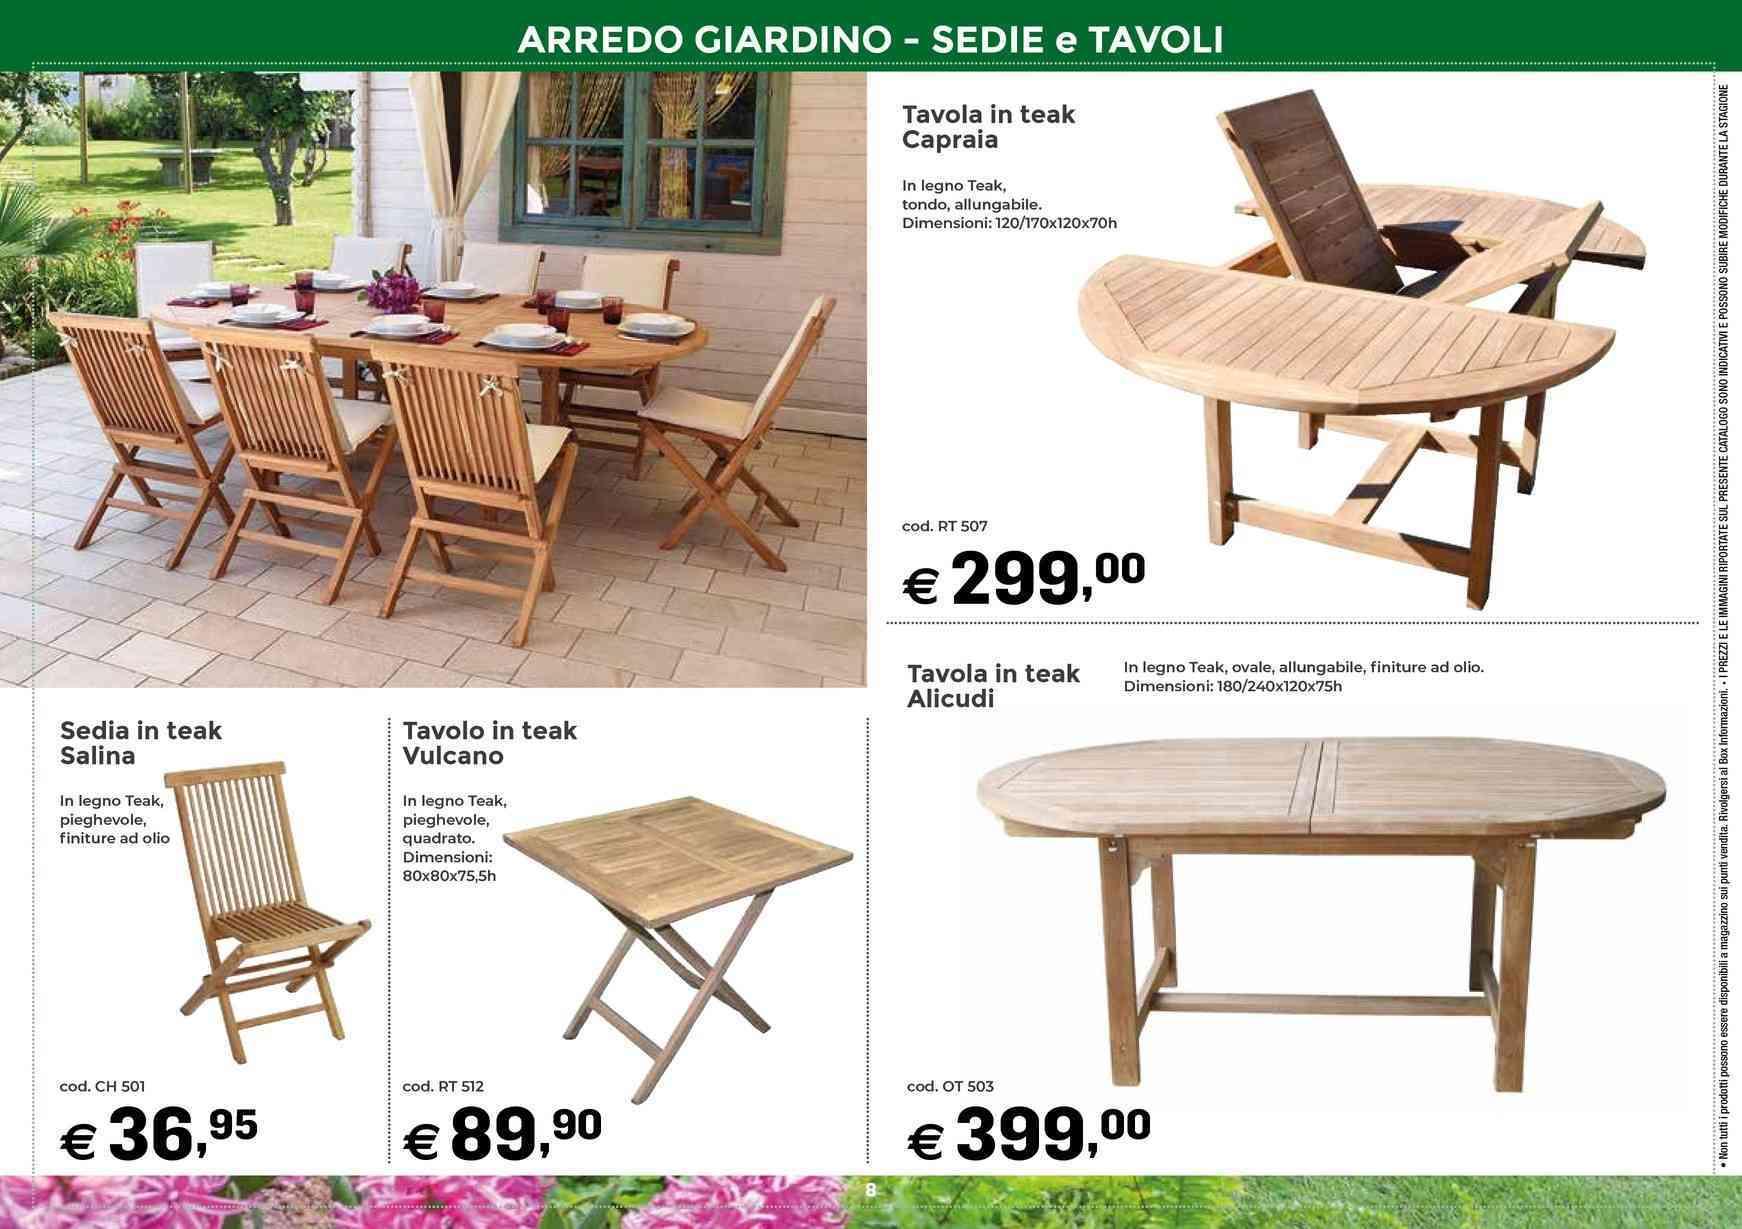 Offerte Tavoli da giardino nel volantino, prezzi negozio